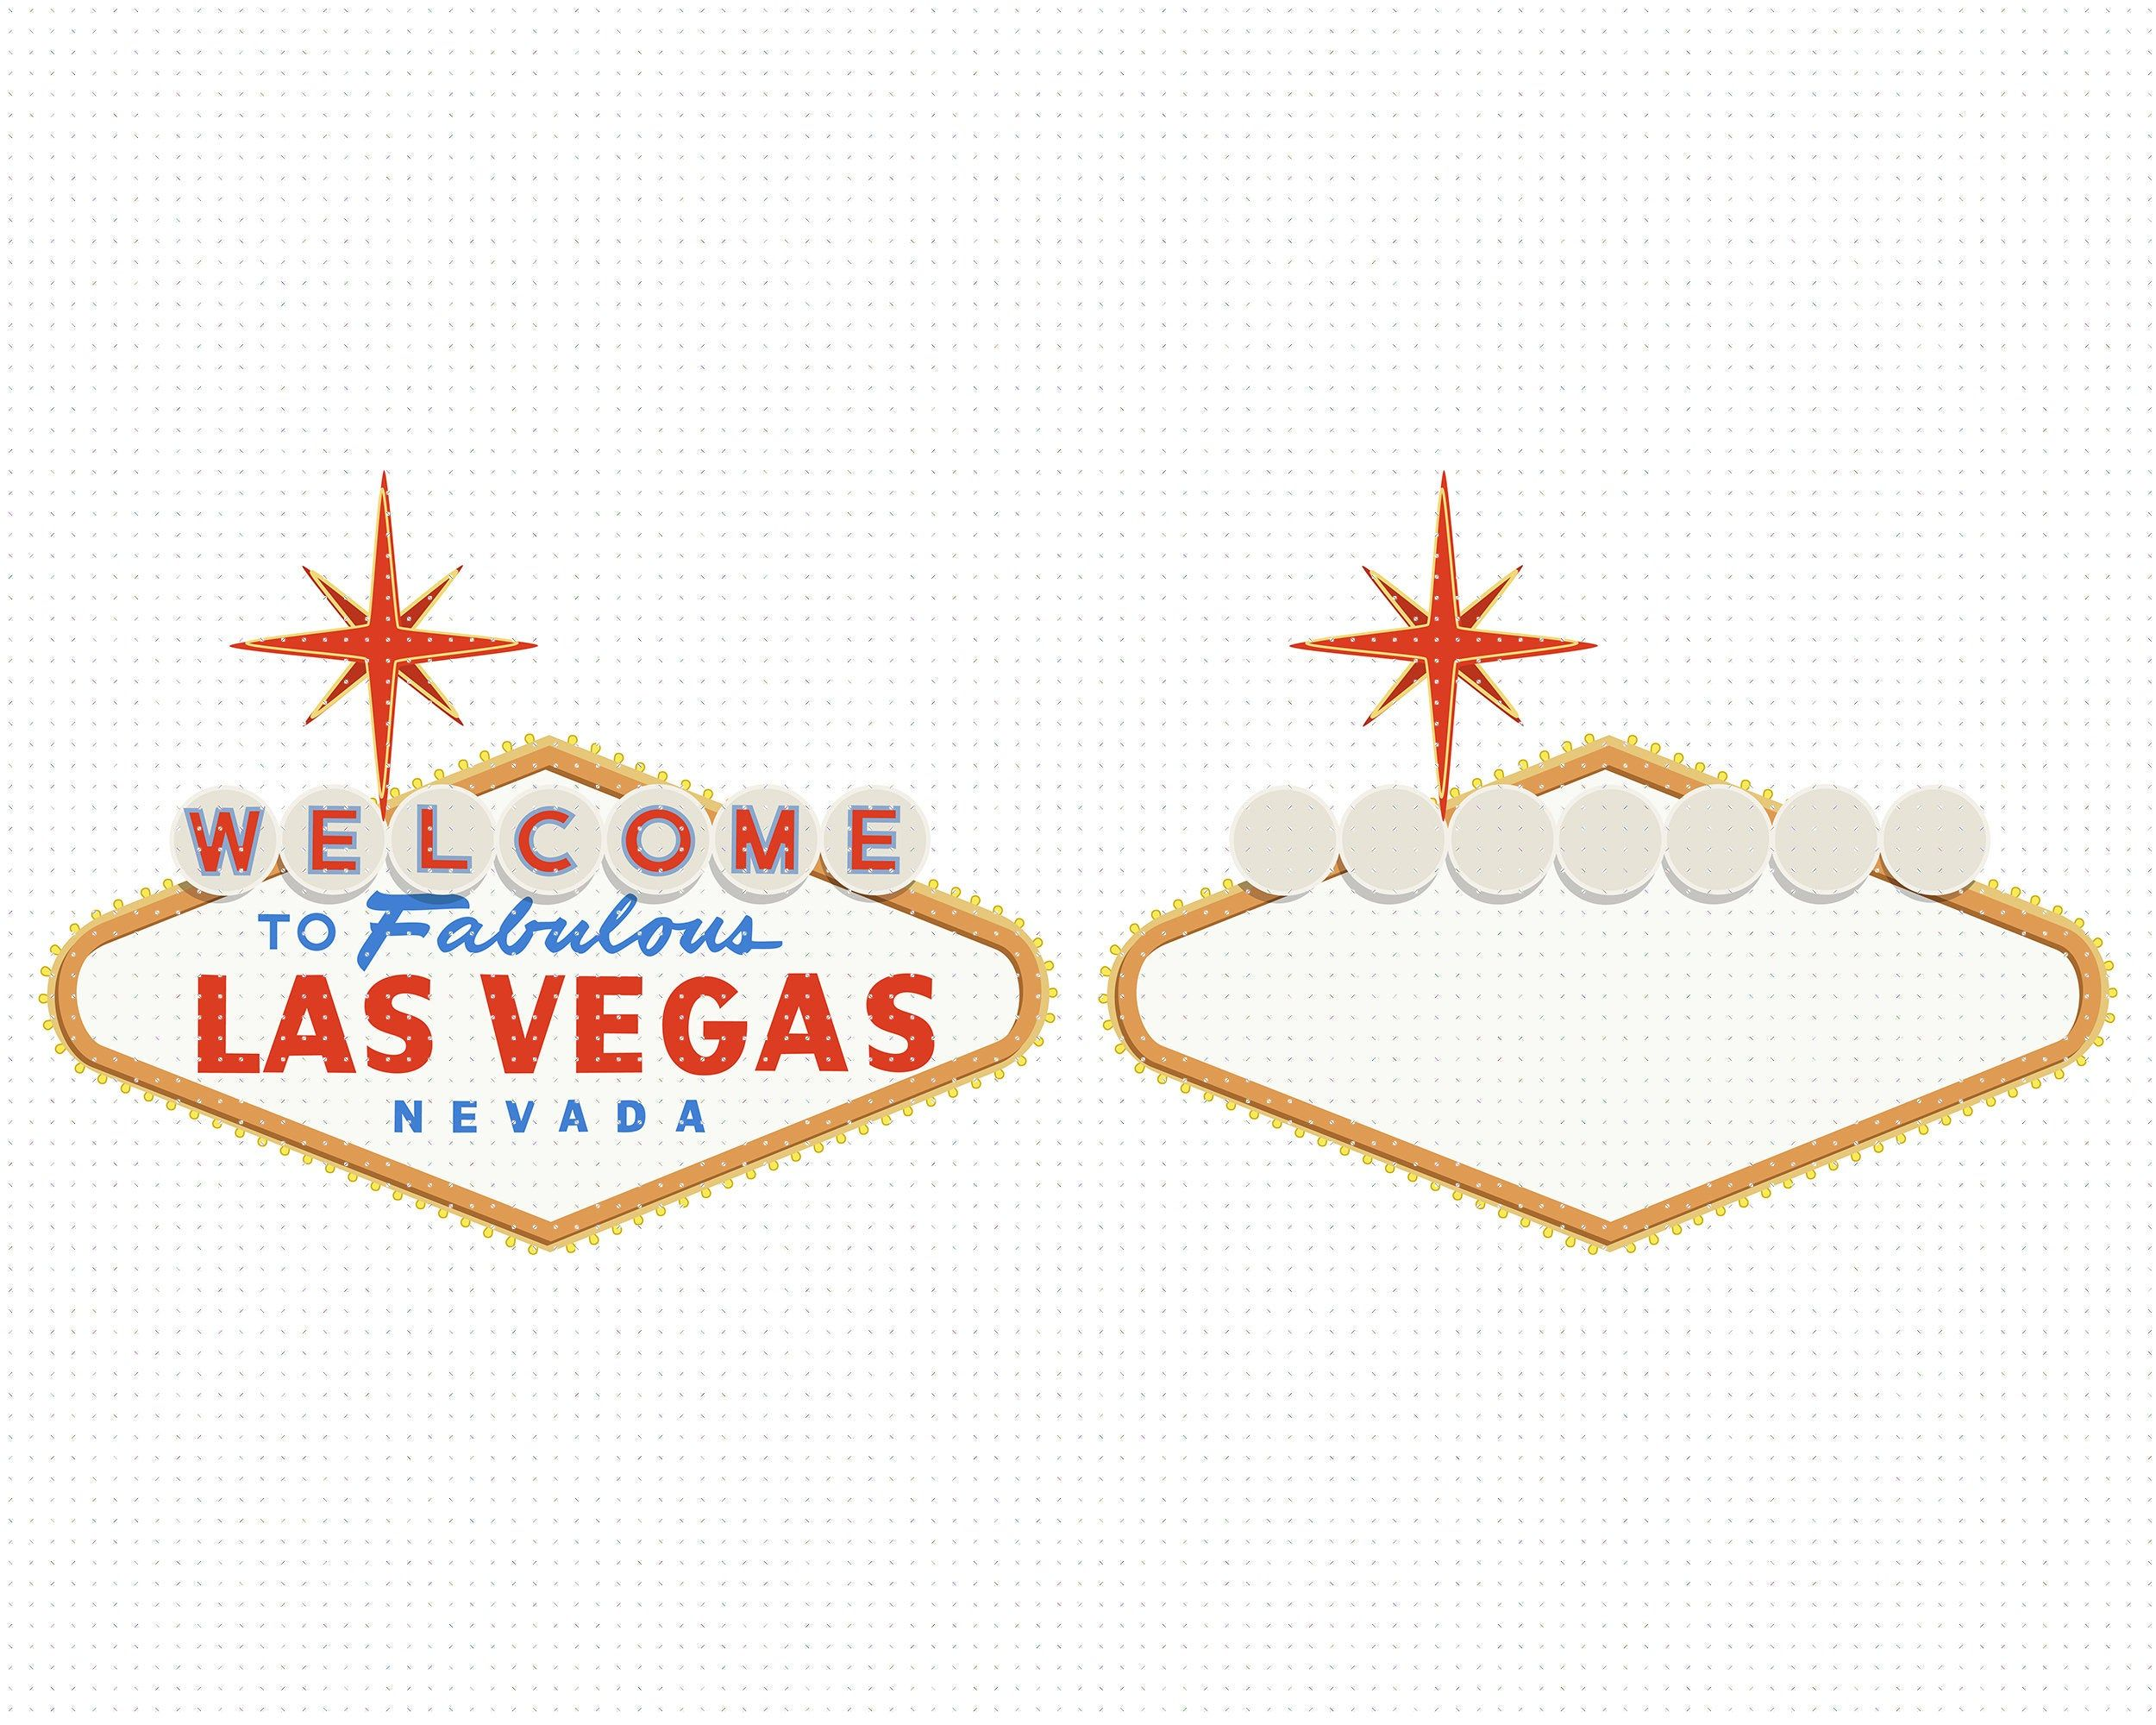 Welcome To Las Vegas Sign Svg Las Vegas Sign Svg Las Vegas Etsy Vegas Sign Las Vegas Sign Las Vegas